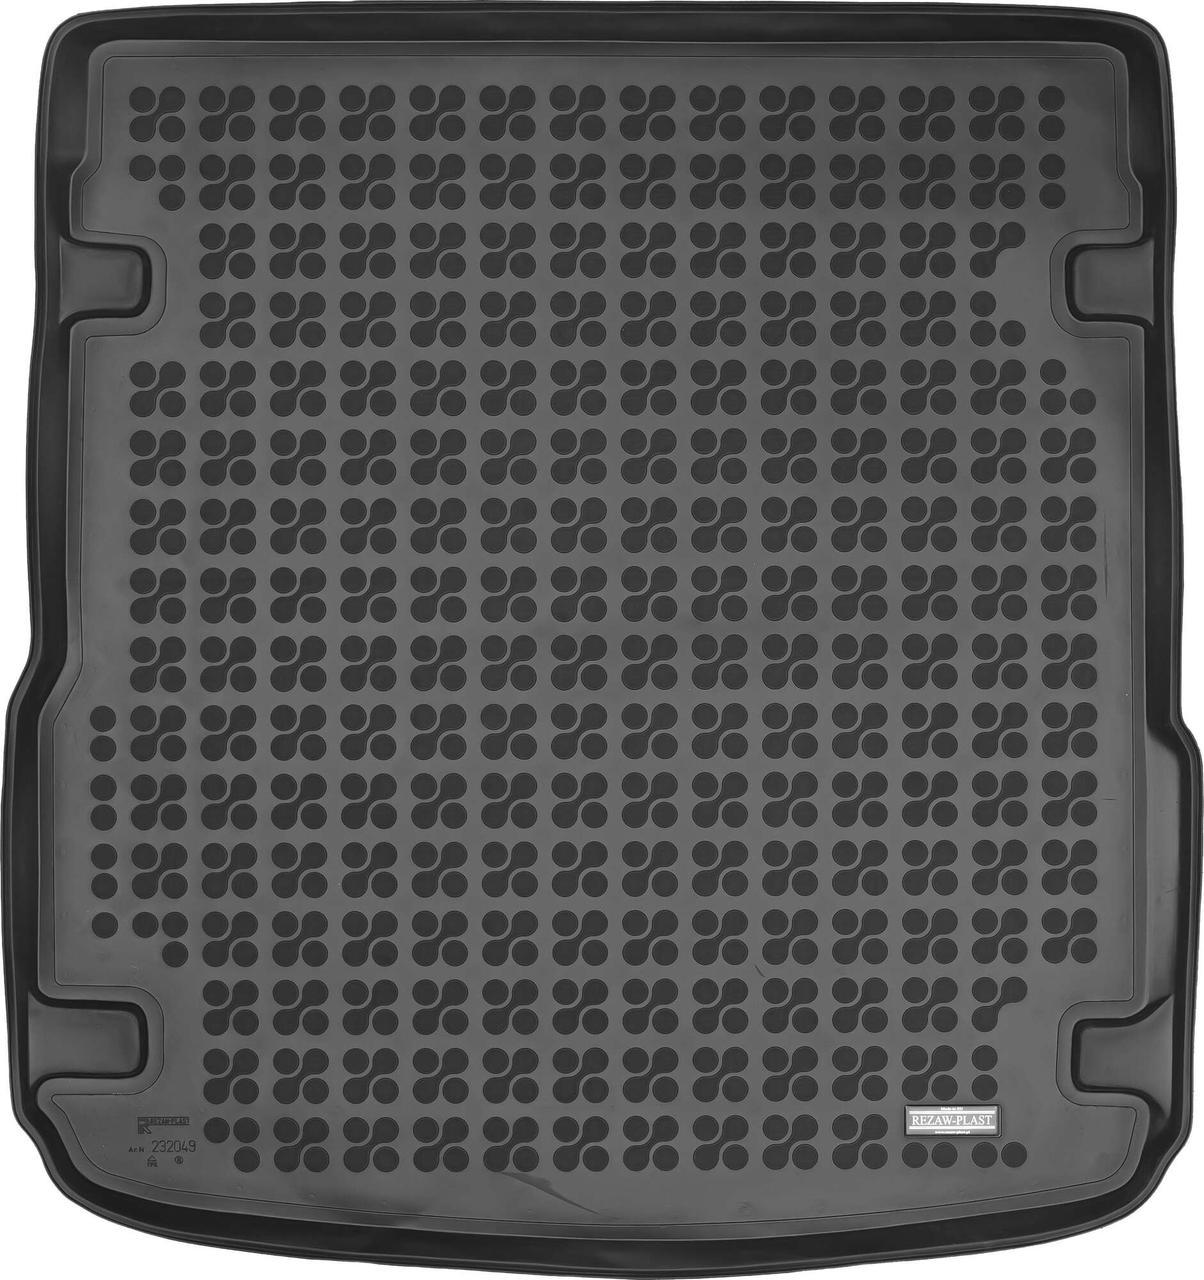 Коврик в багажник Audi A6 Avant V C8 2018 - Rezaw-Plast RP 232049